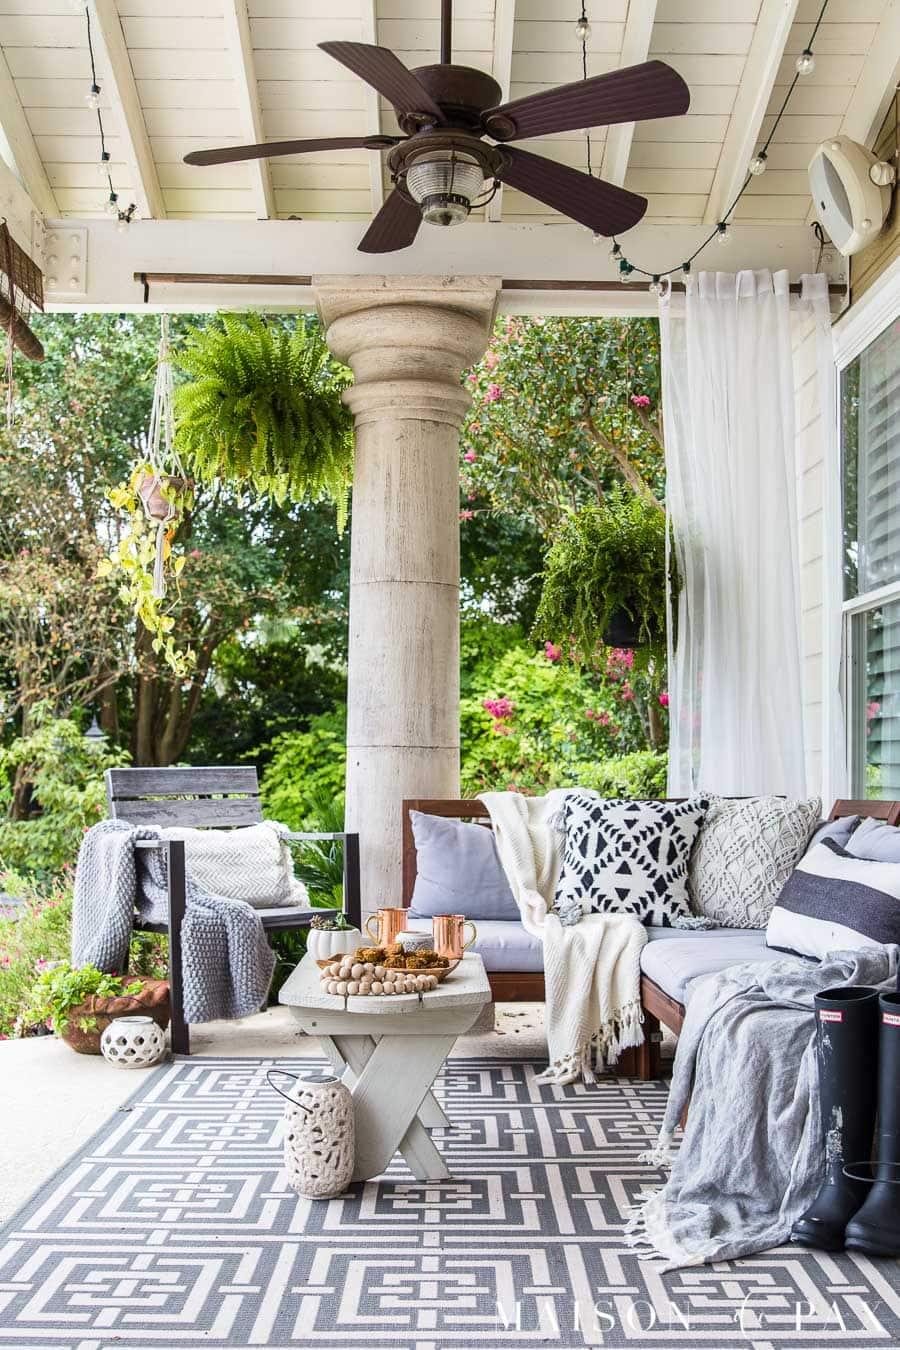 Black and White Fall Porch Decorating Ideas - Maison de Pax on White Patio Ideas id=97103